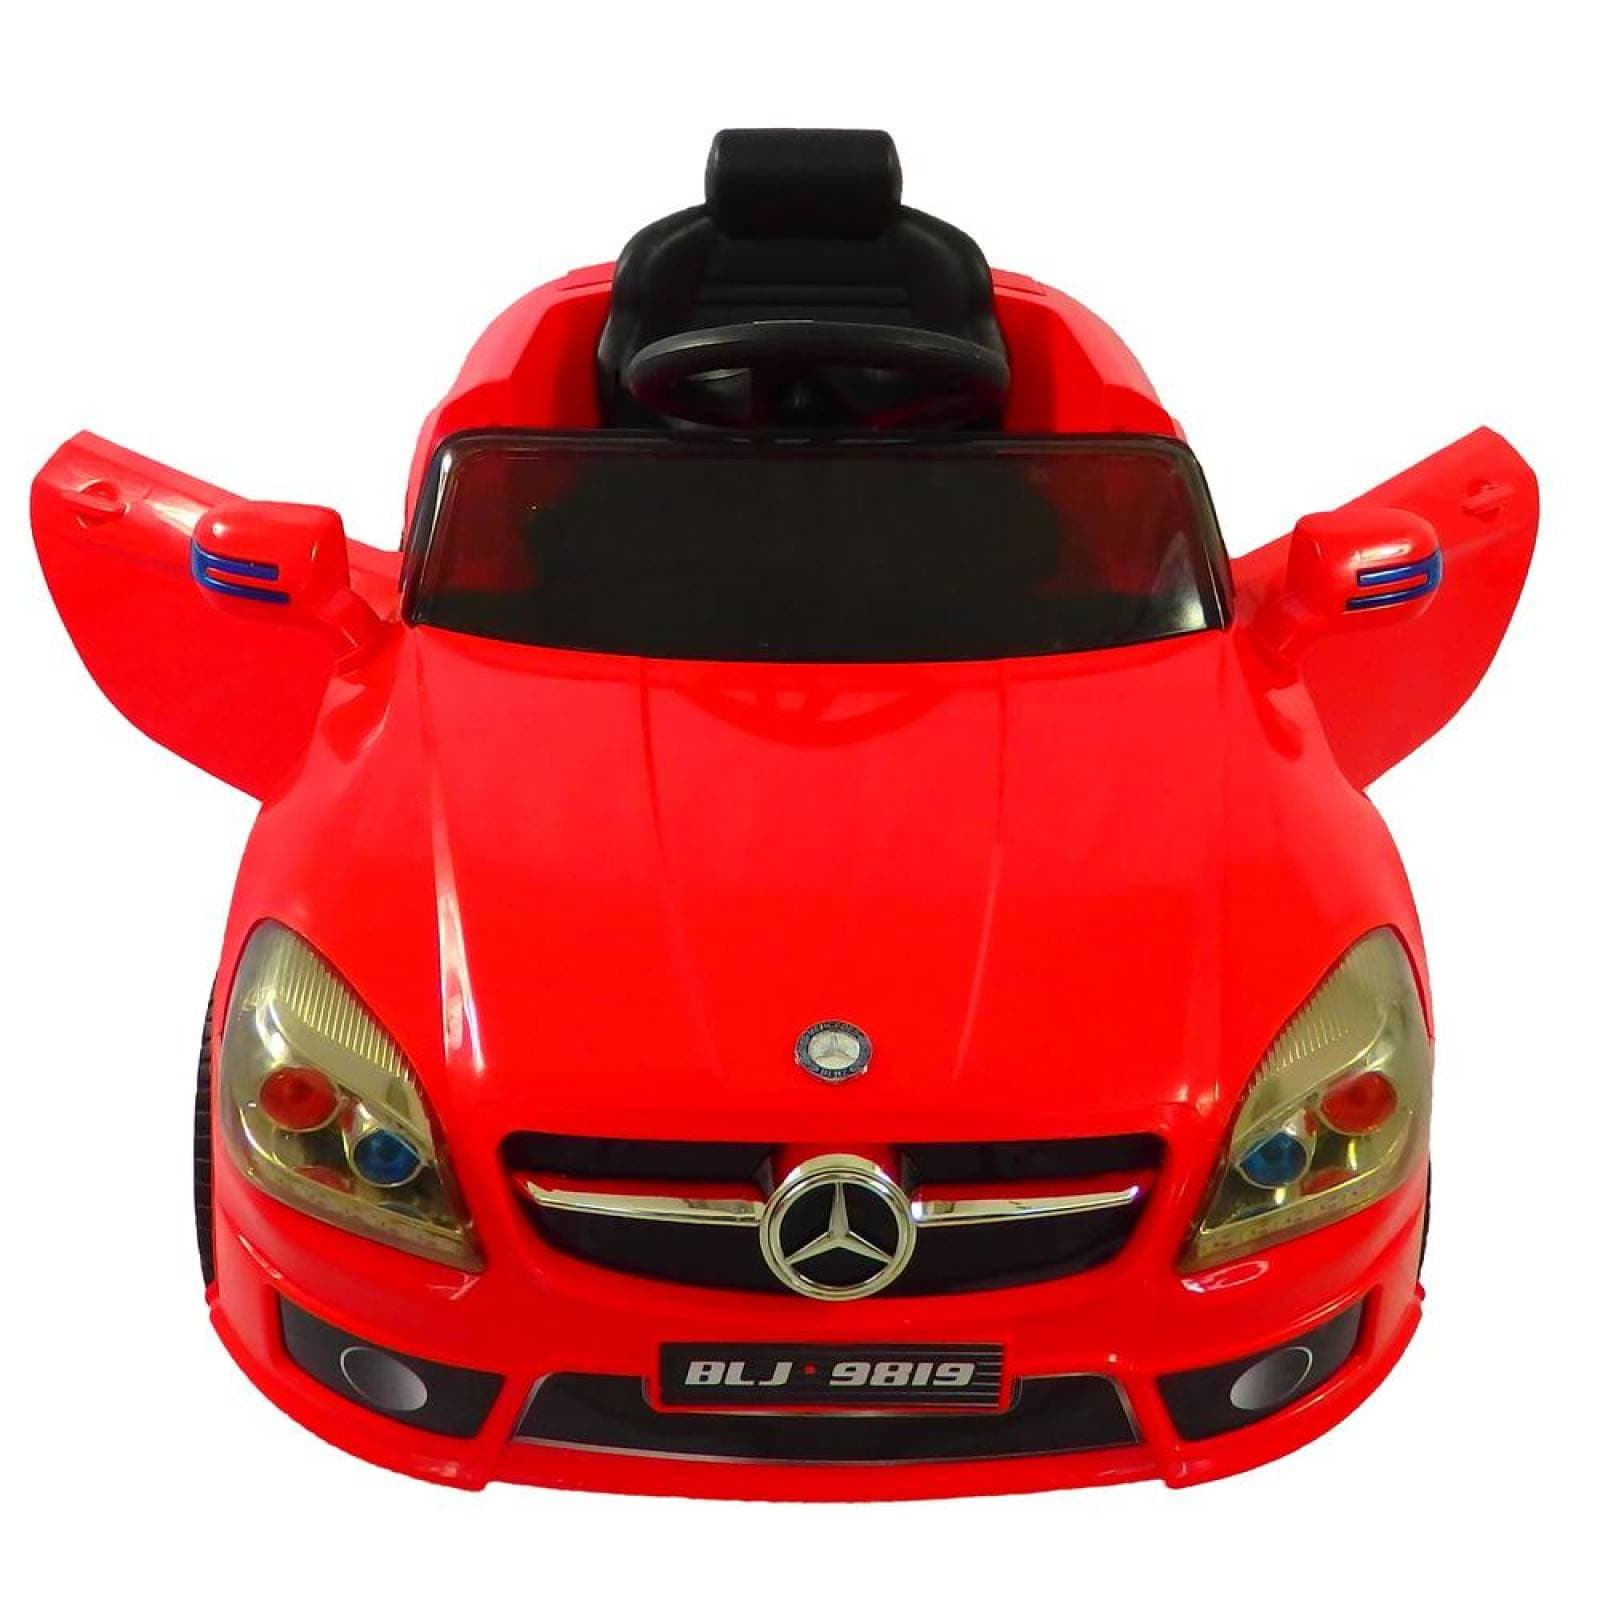 Carro Electrico Montable Con Control Remoto Mercedes Benz Rojo